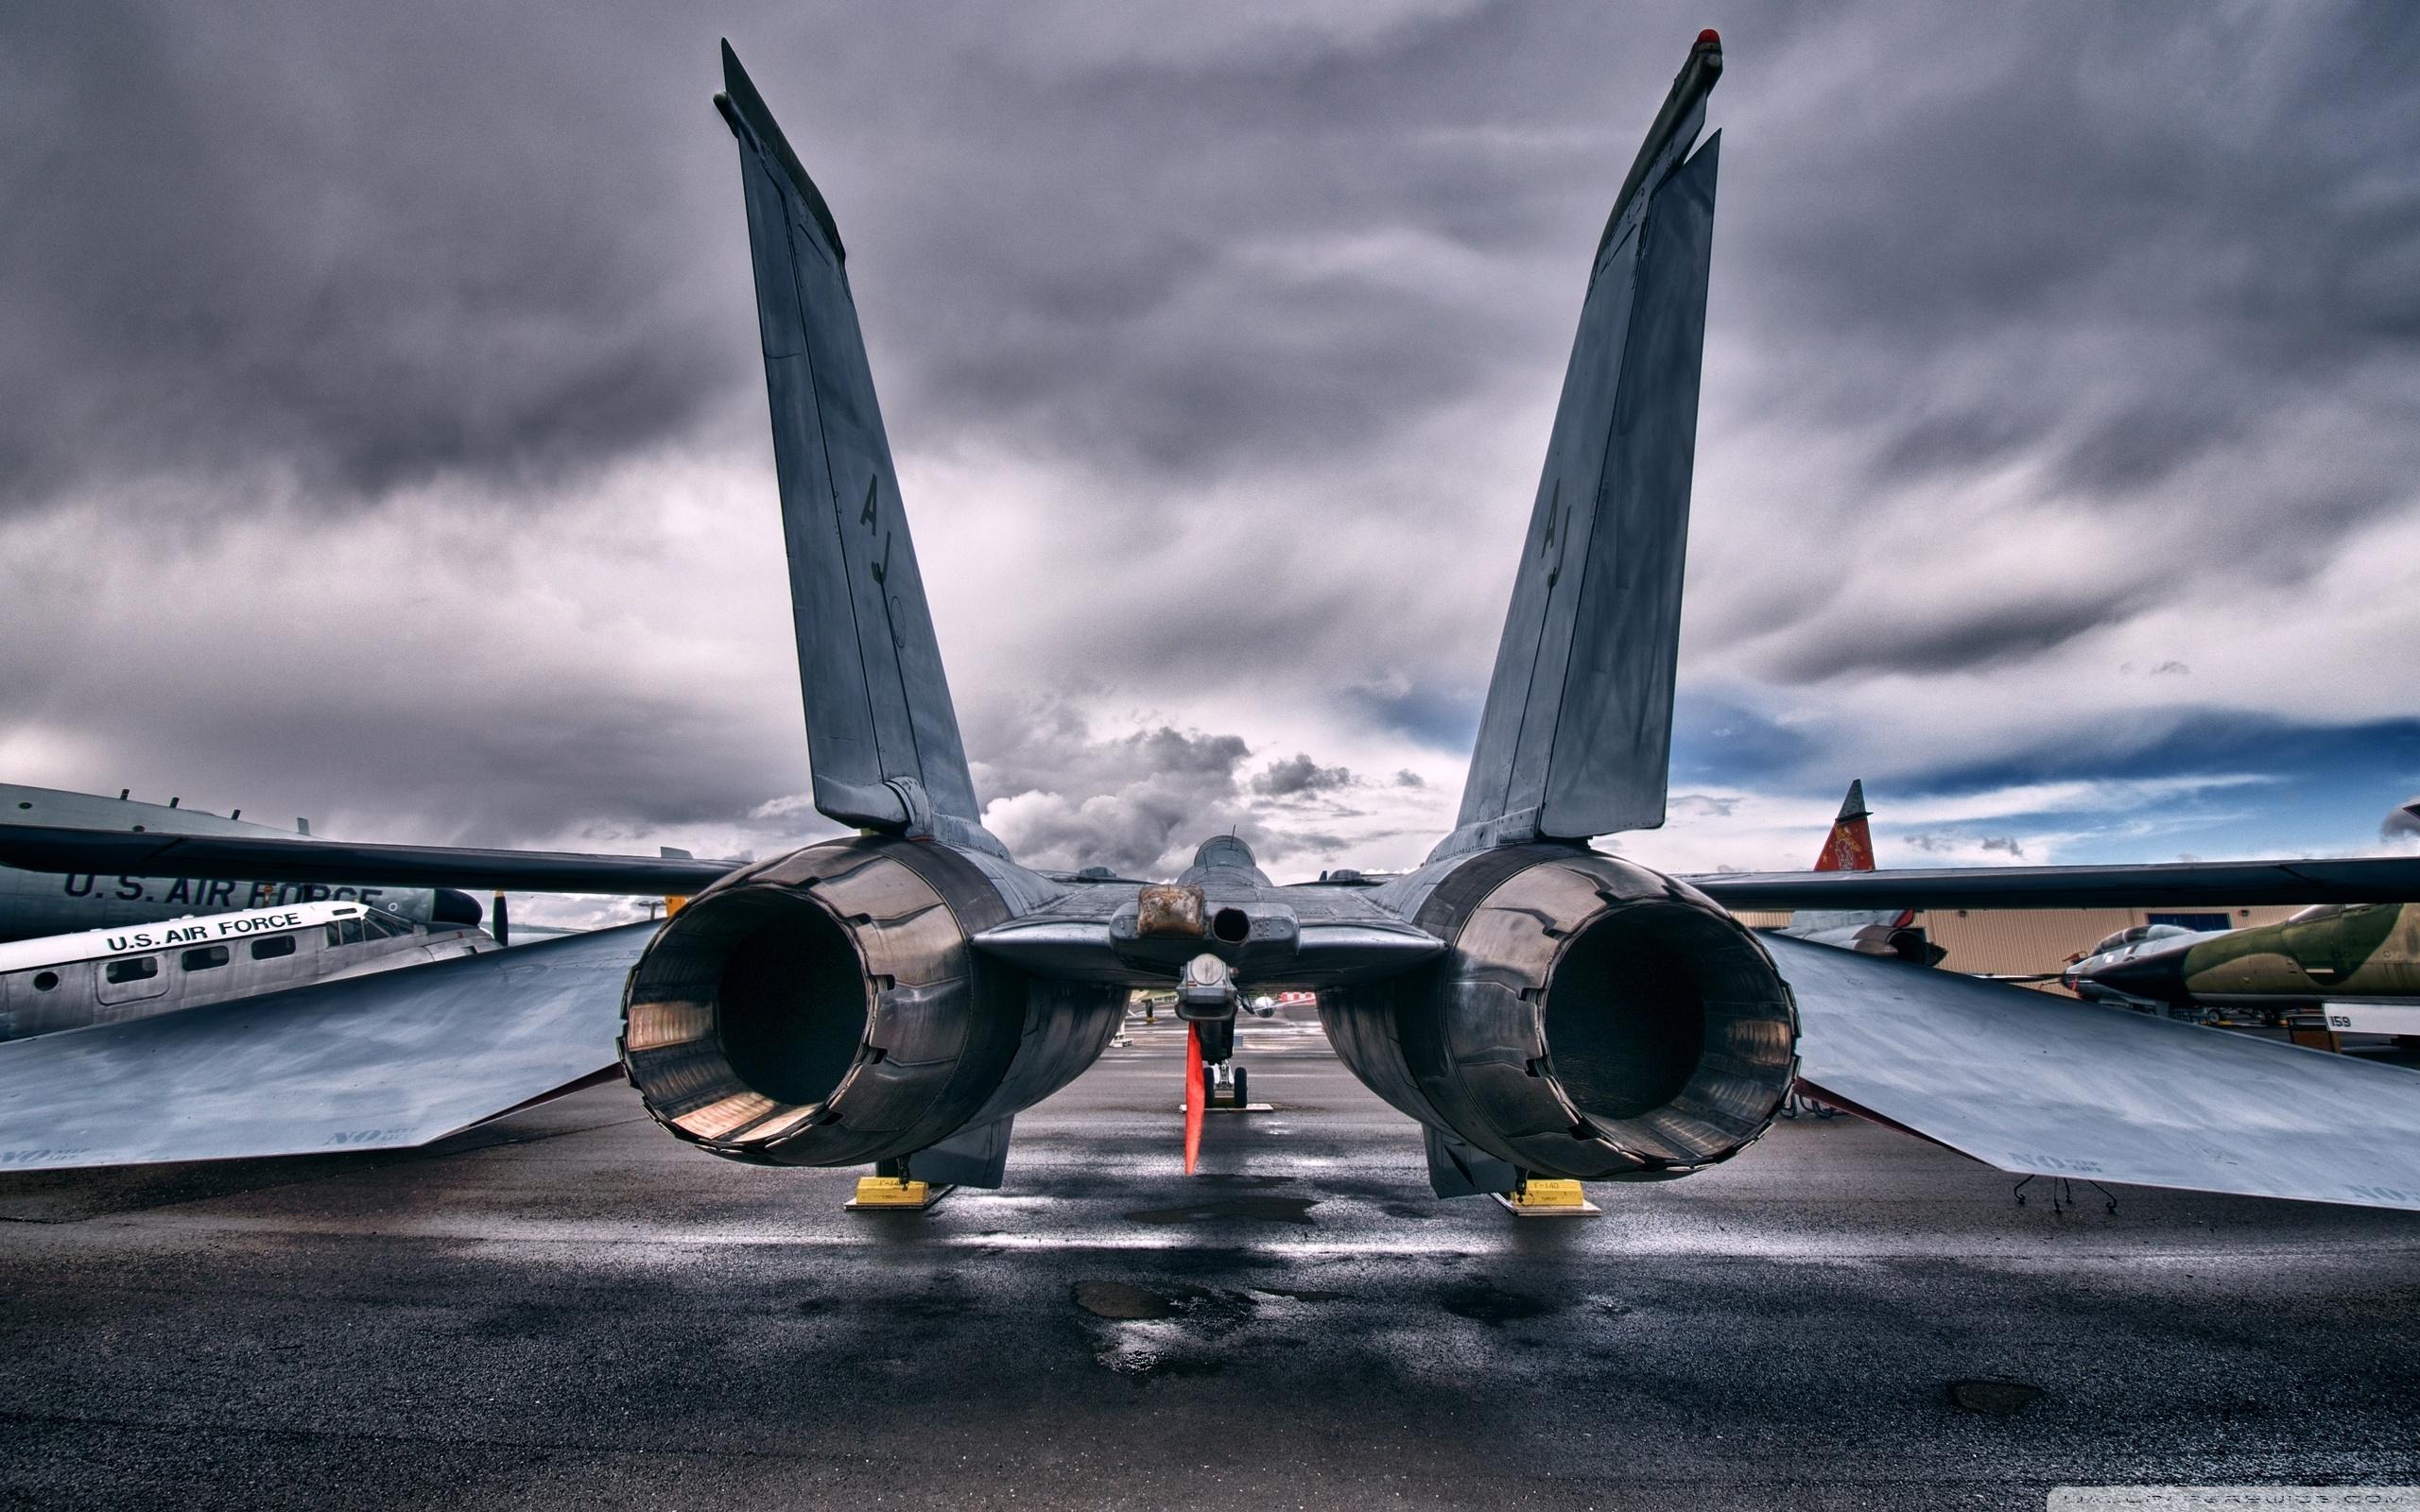 us air force ❤ 4k hd desktop wallpaper for 4k ultra hd tv